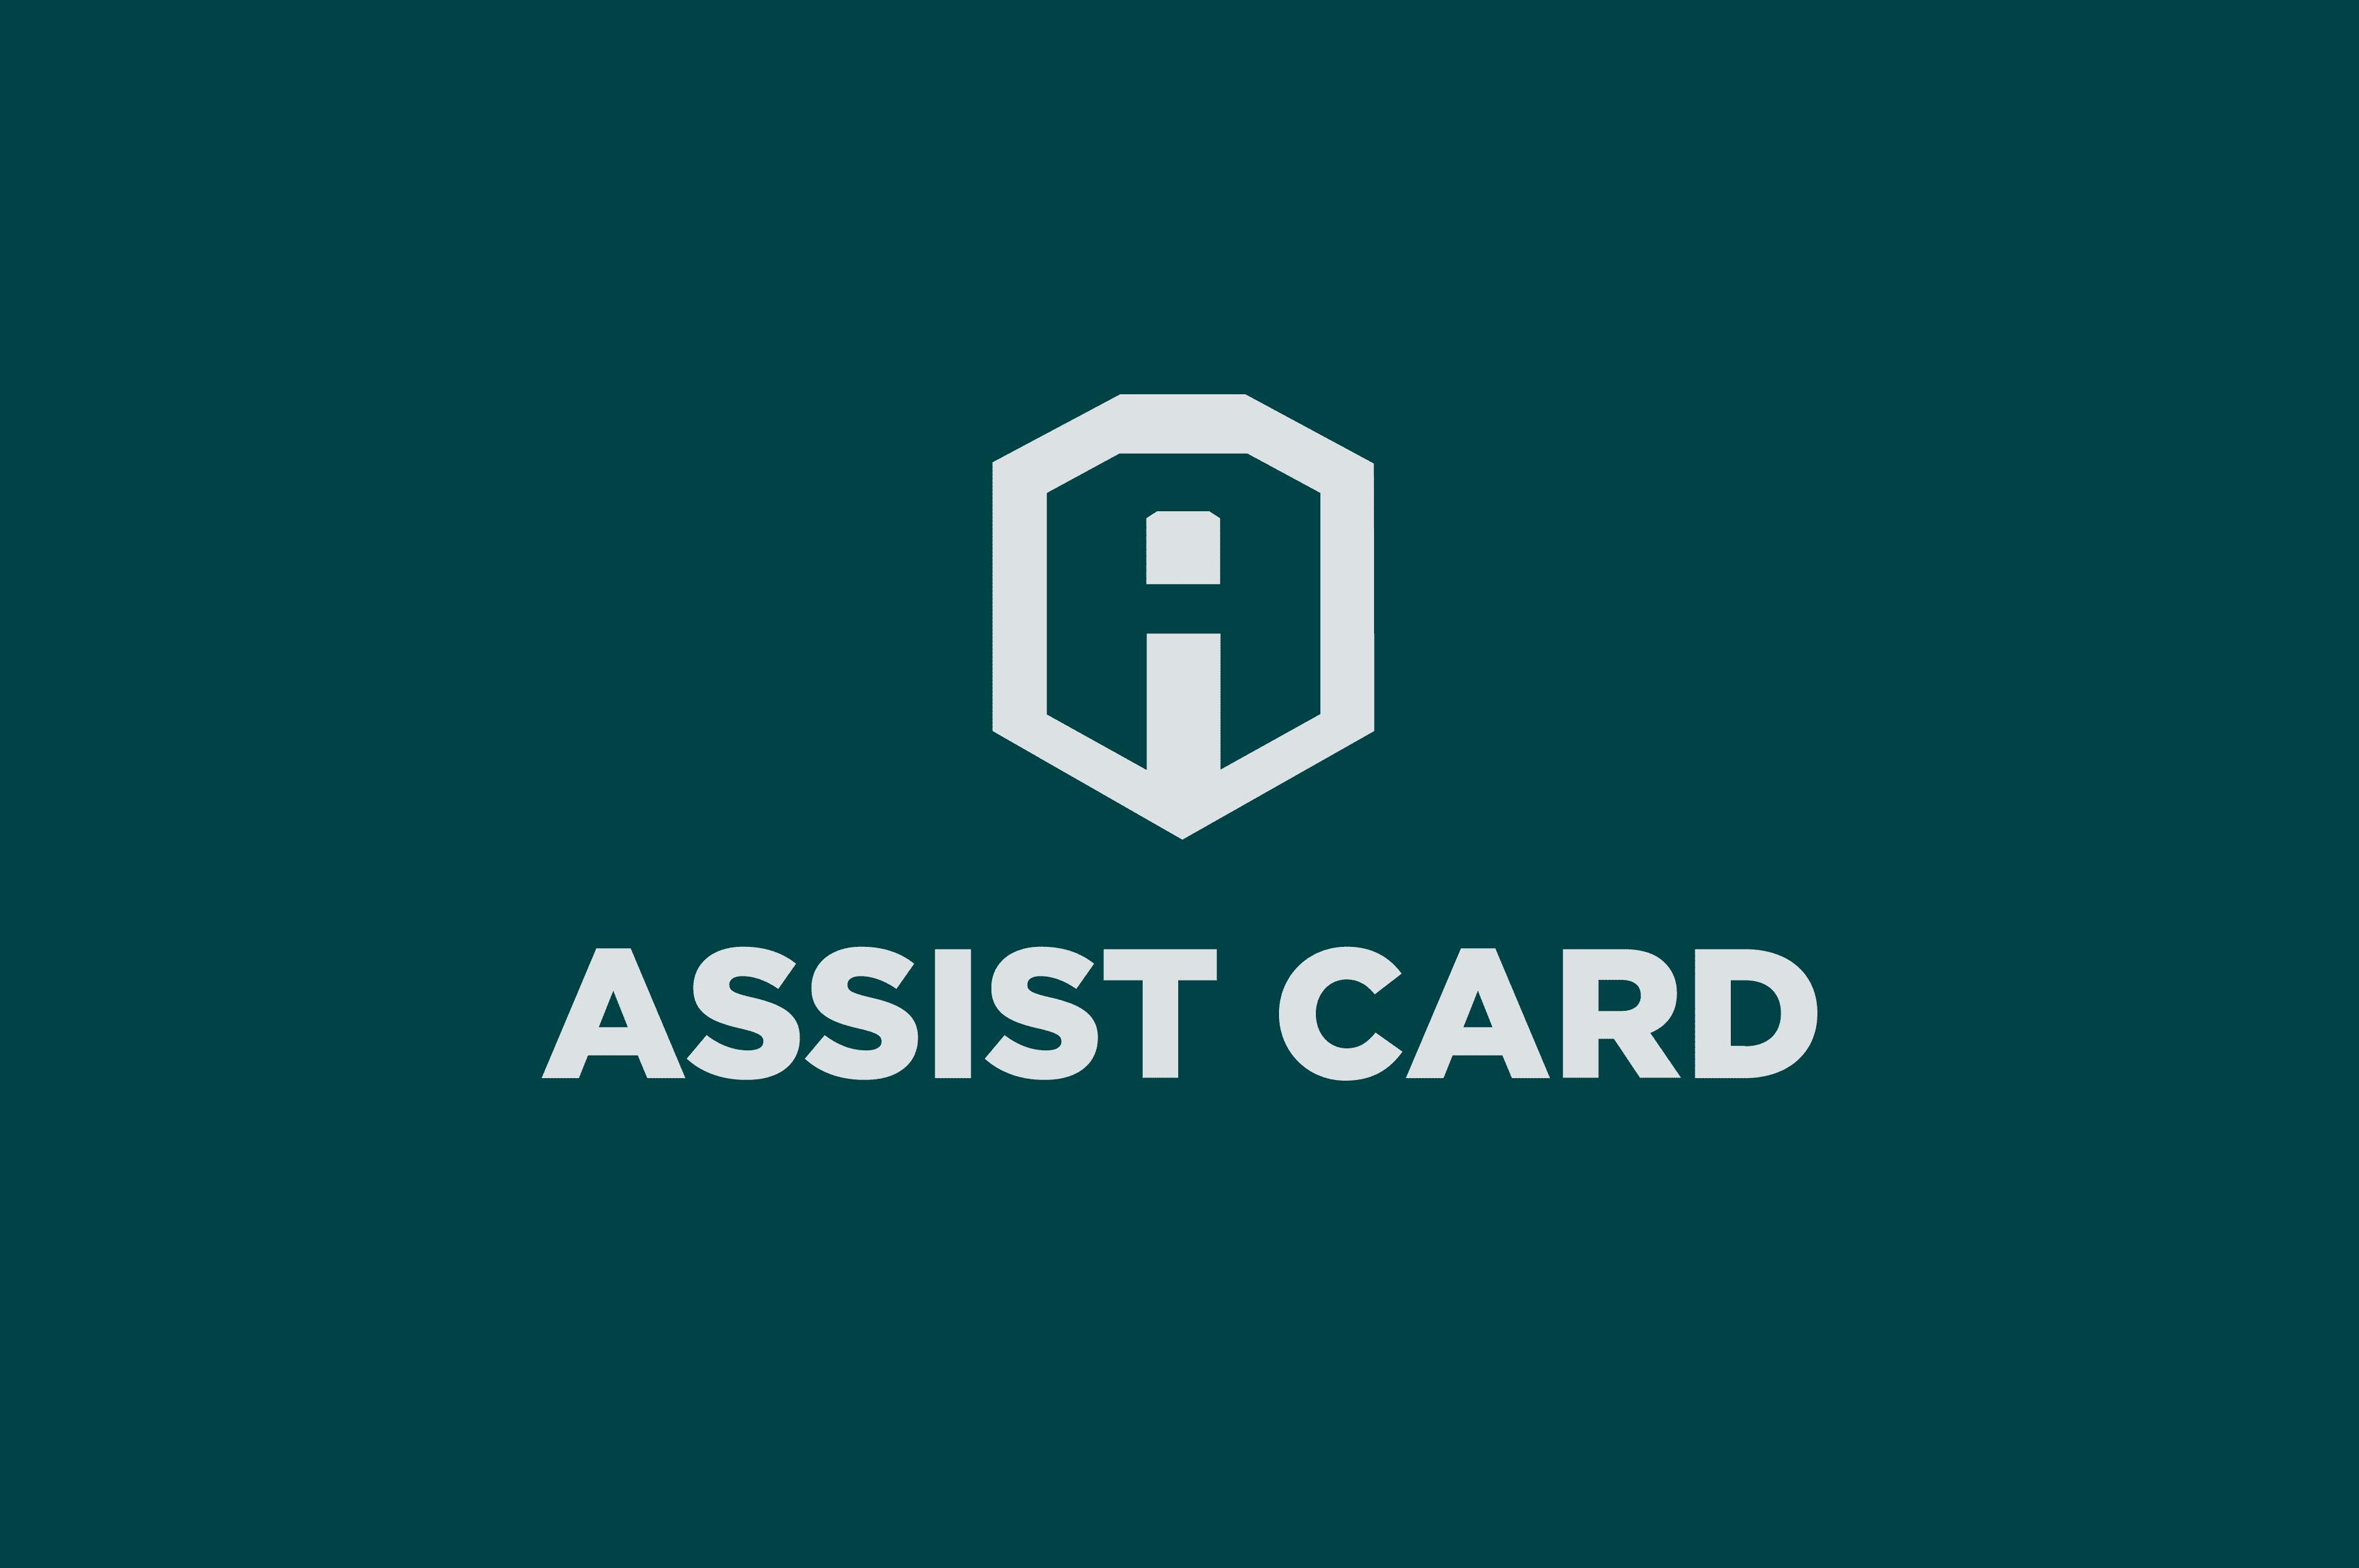 Assist card logo